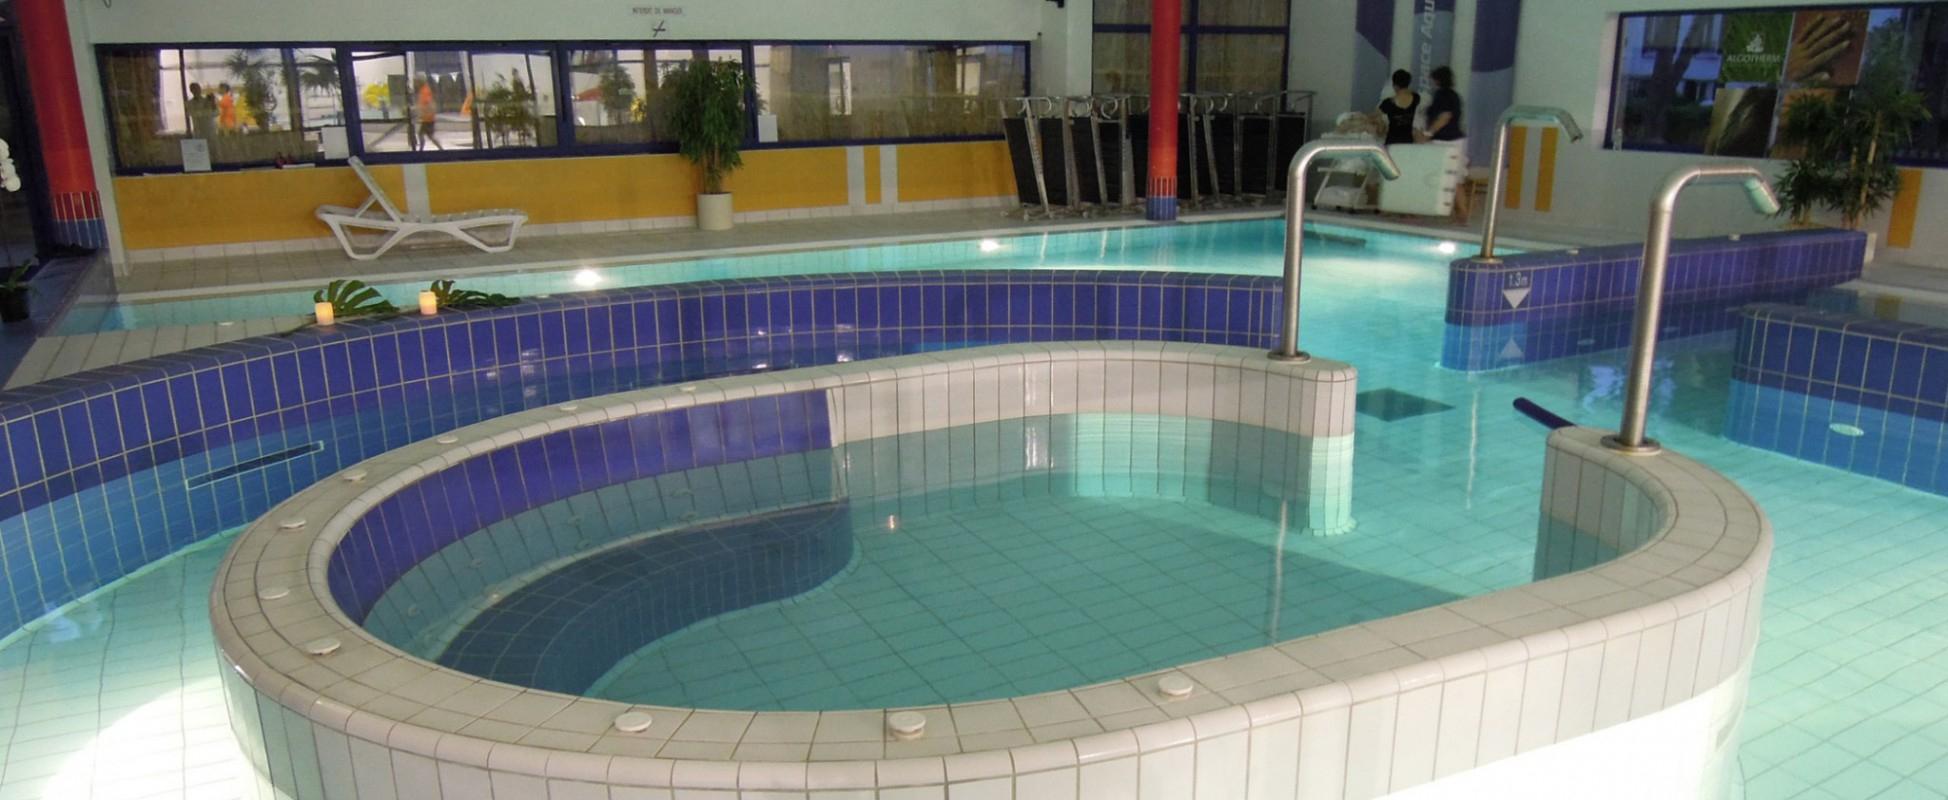 Centre Aquatique De Bois Colombes | Spaetc.fr avec Piscine De Bois Colombes